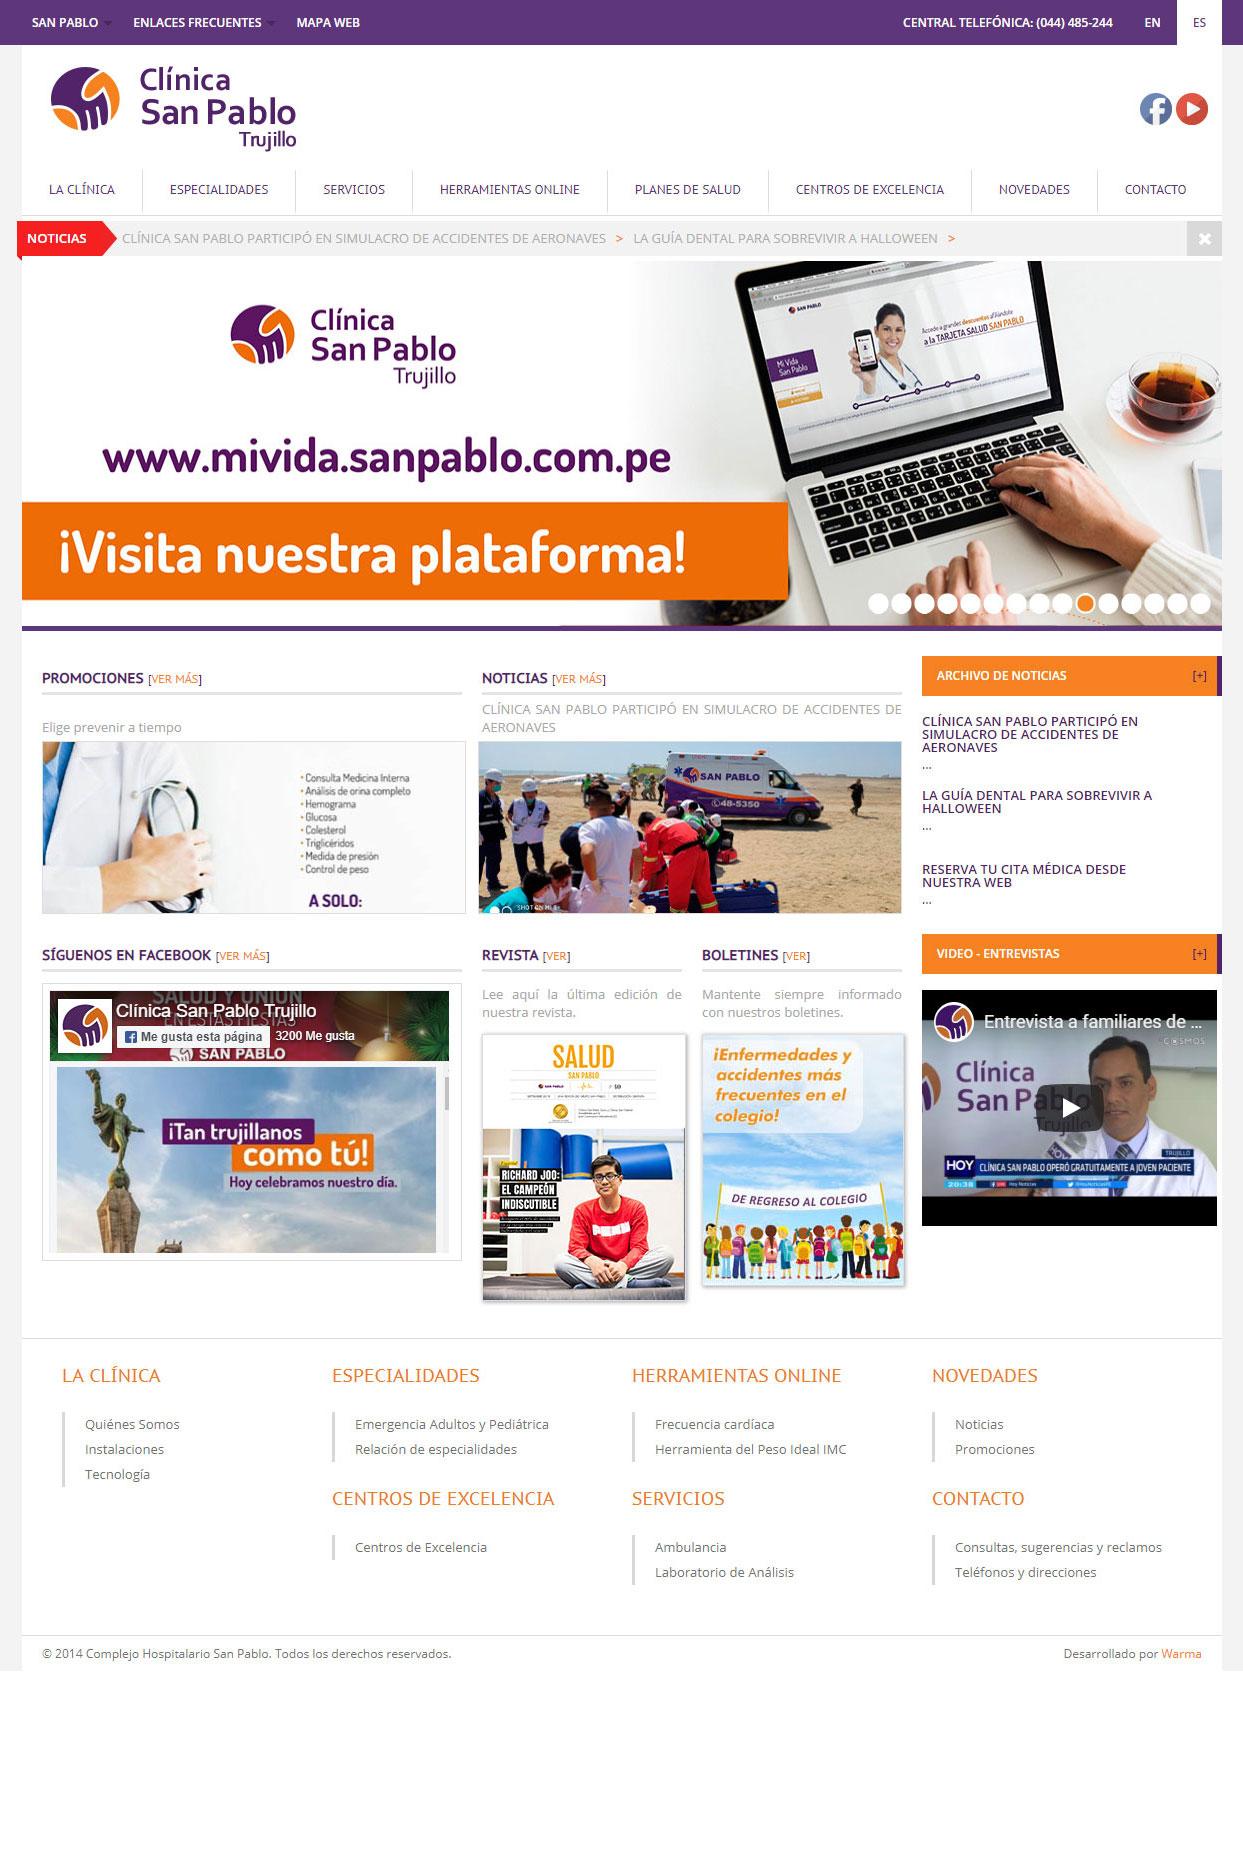 Clínica San Pablo Trujillo